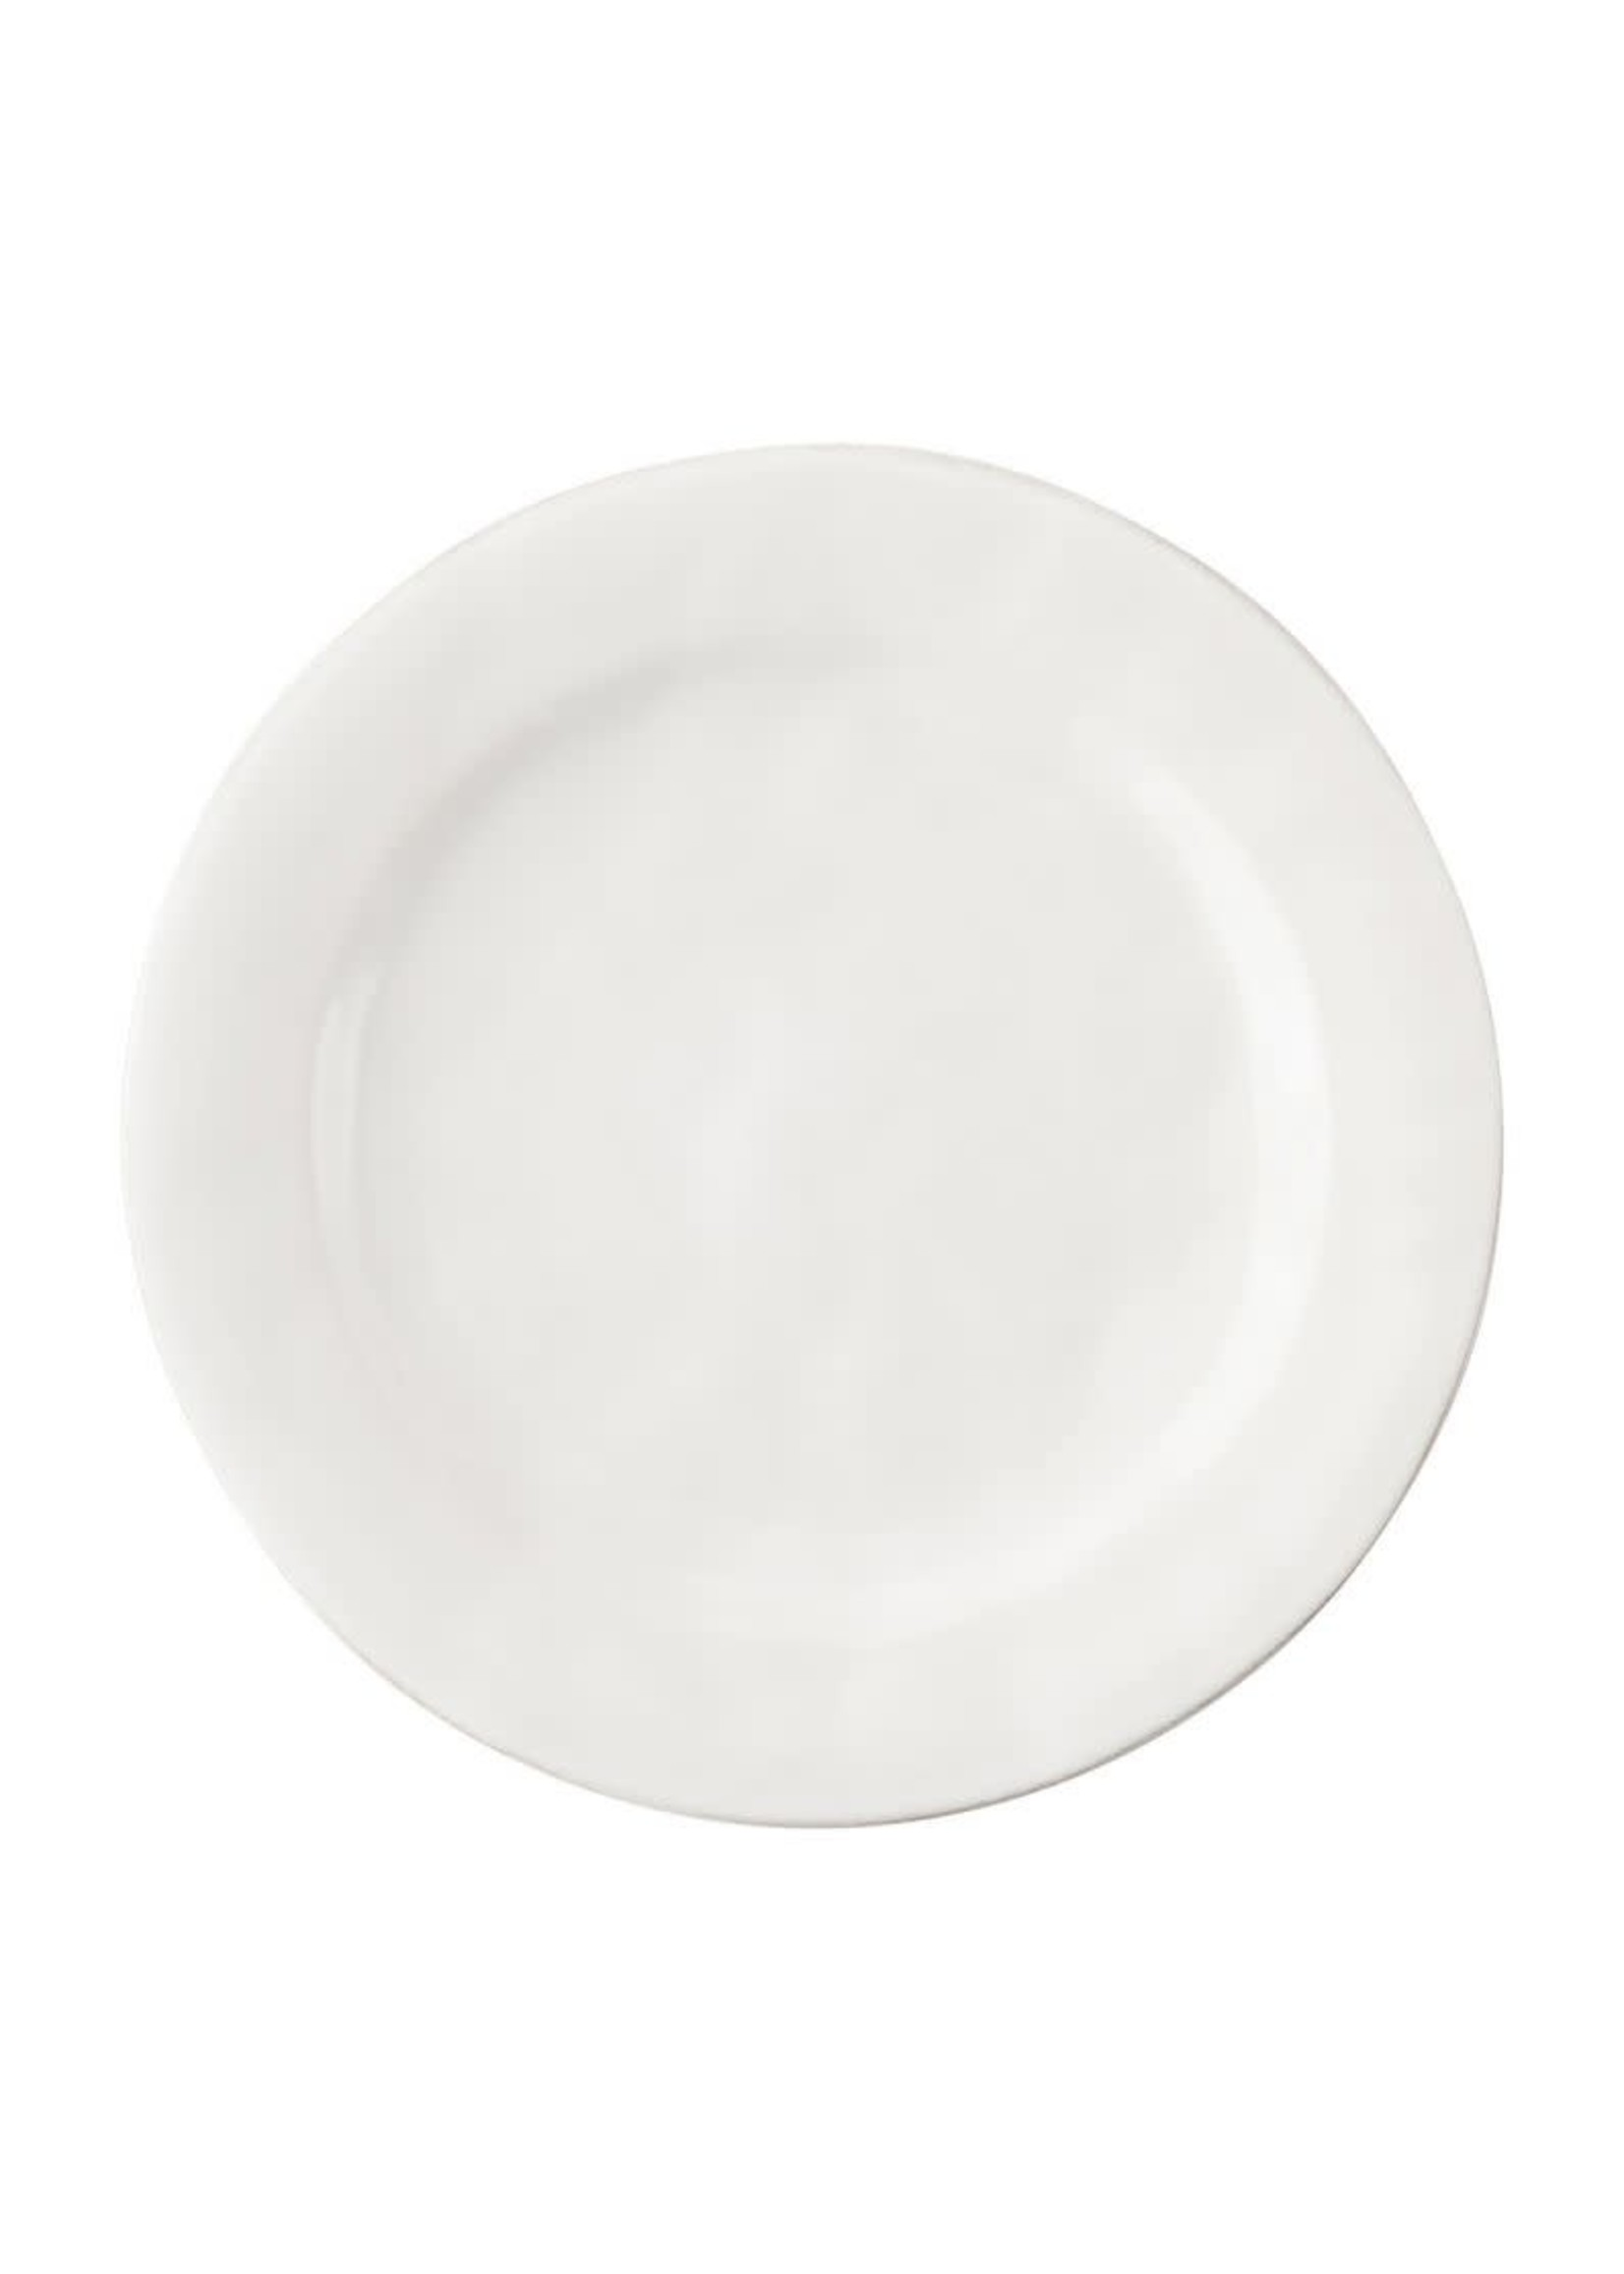 Juliska Puro White Dessert/Salad Plate